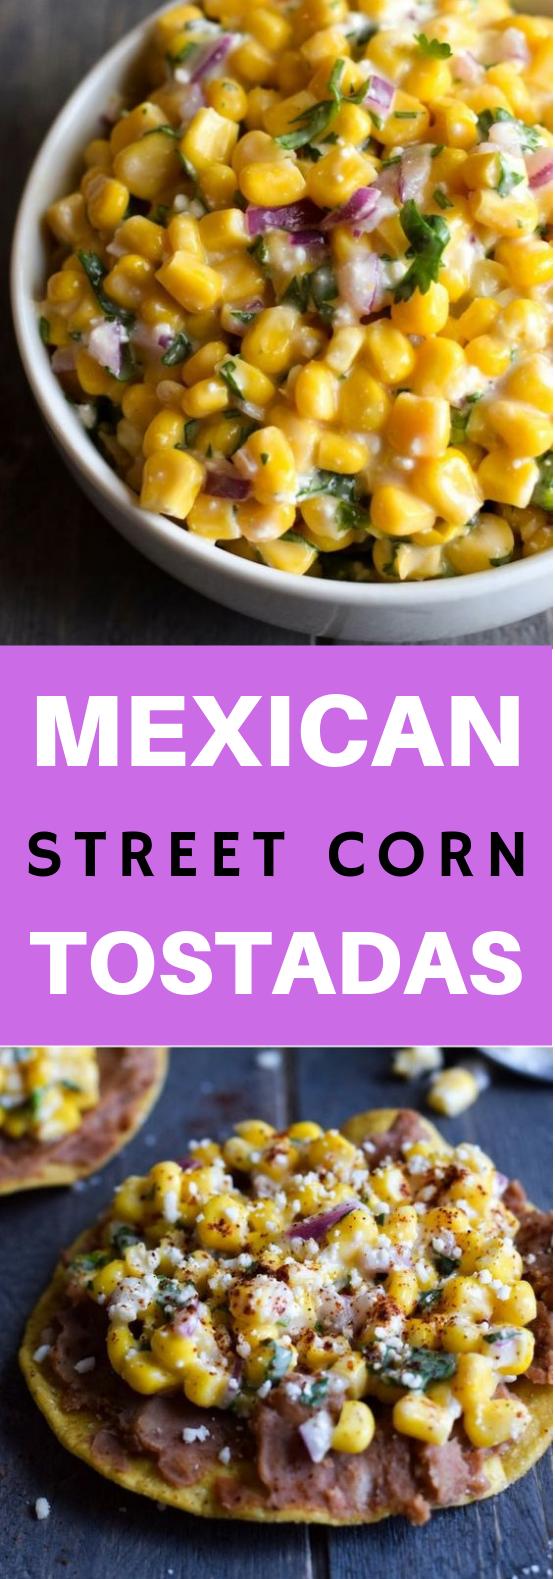 Mexican Street Corn Tostadas #Vegetarian #Healthyfood